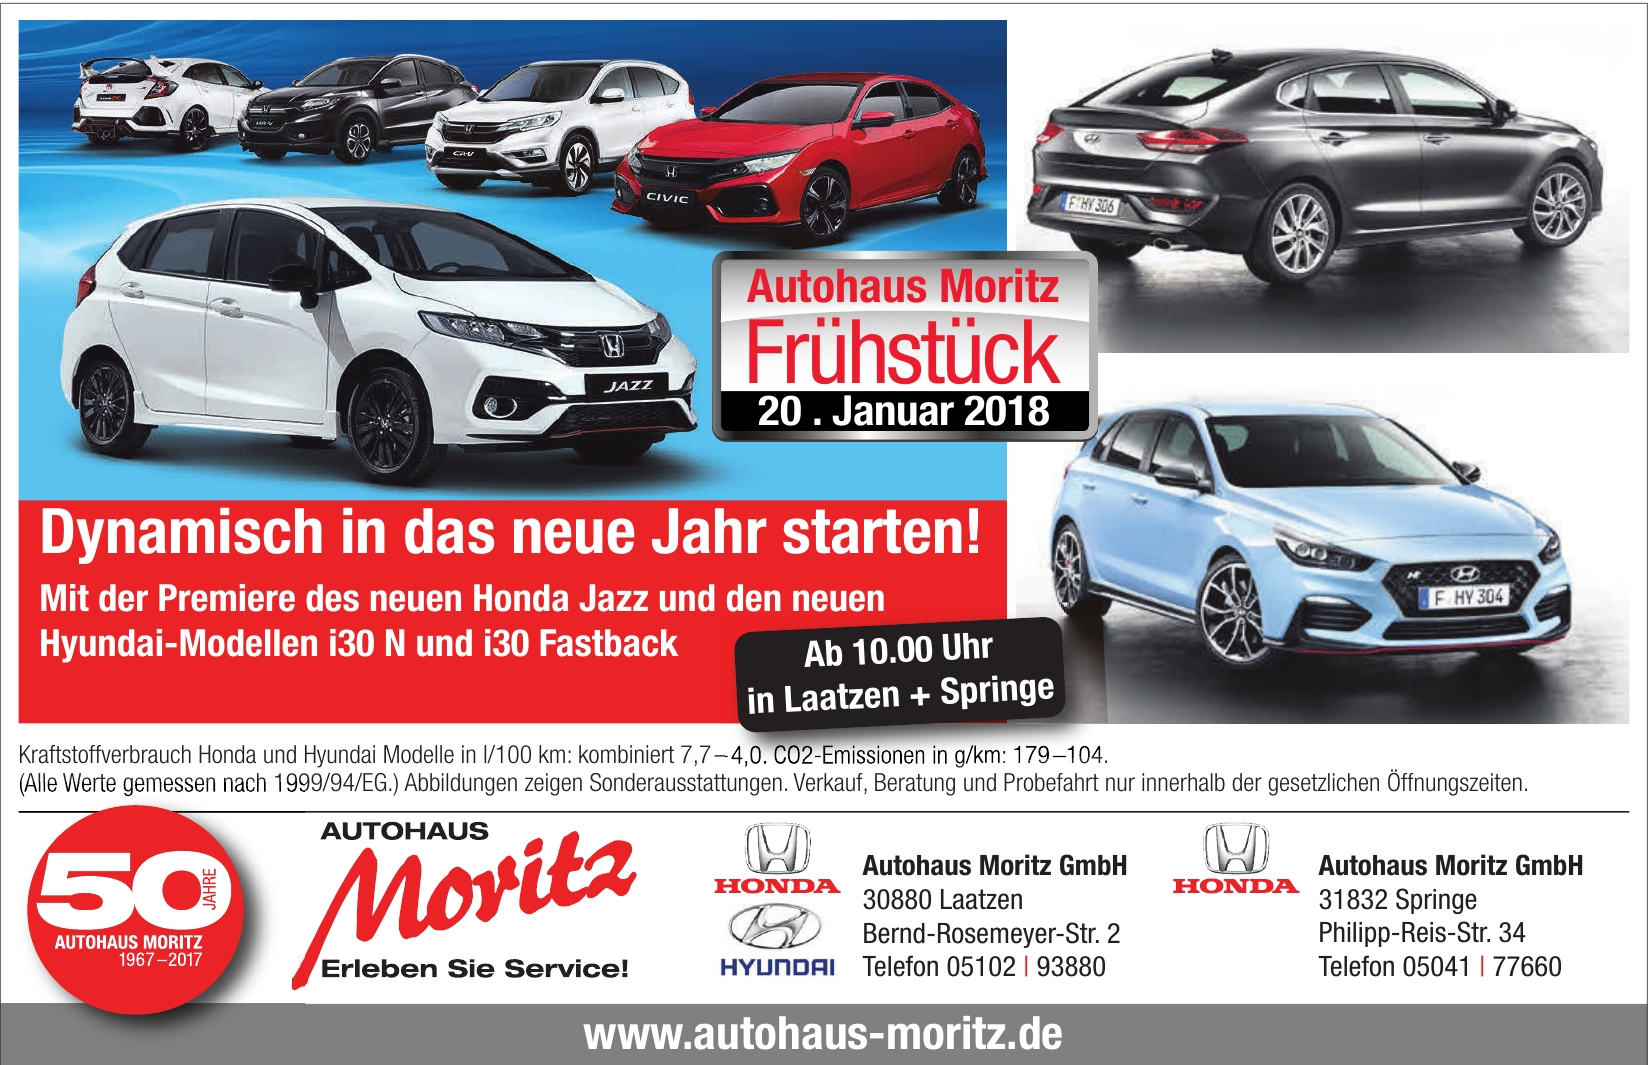 Autohaus Moritz GmbH